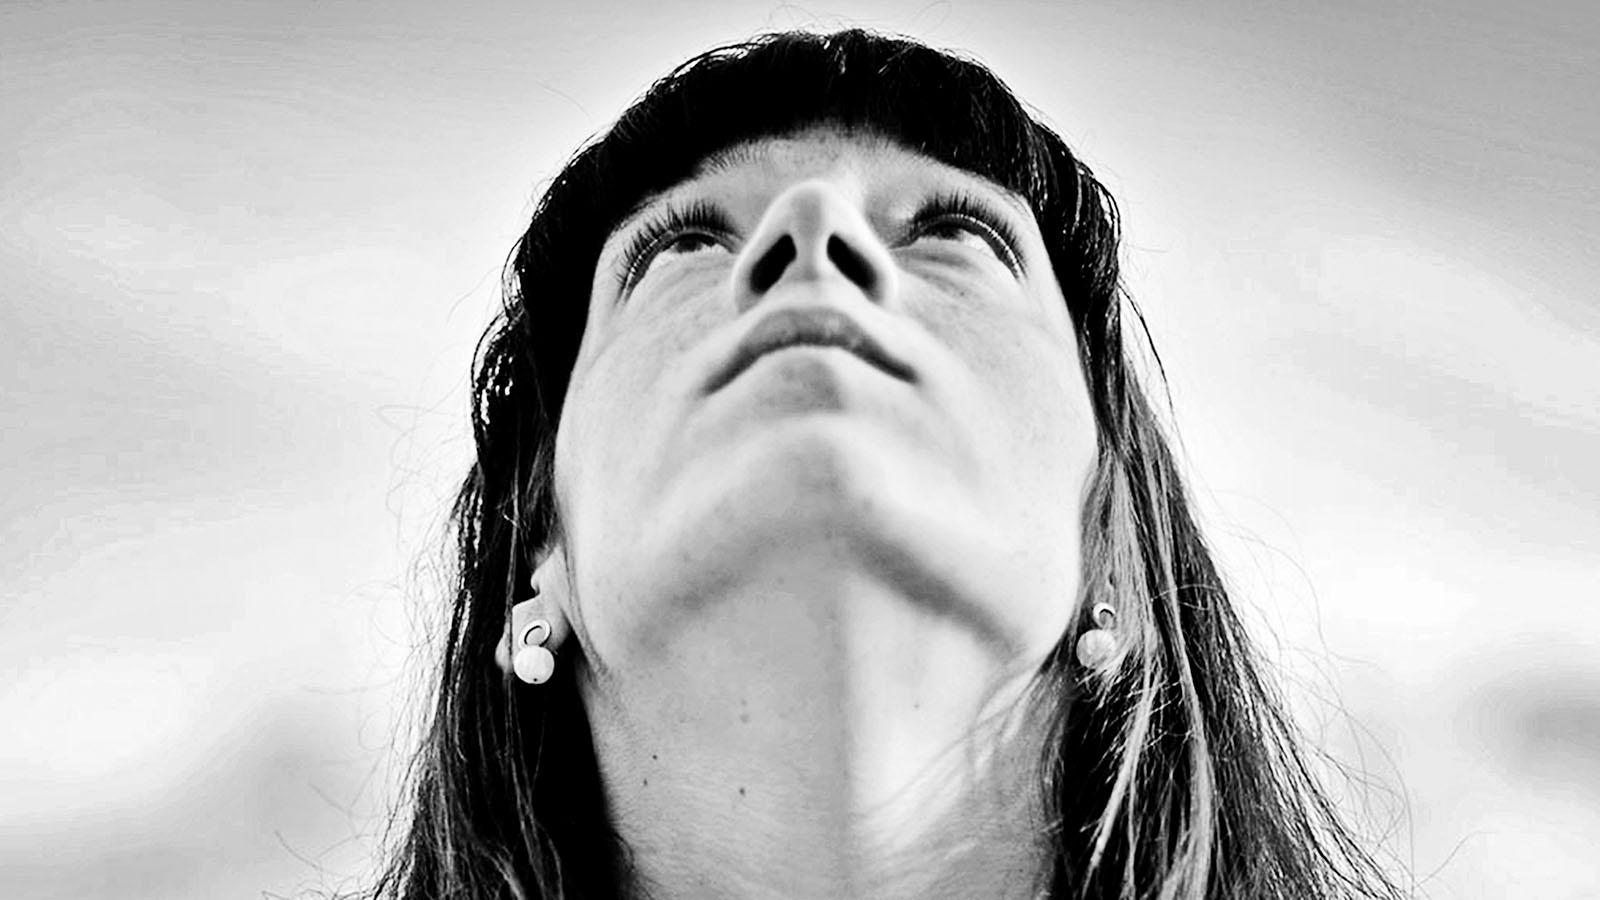 PÚBLICO - A polifonia da guerra pelos olhos de Salomé Lamas